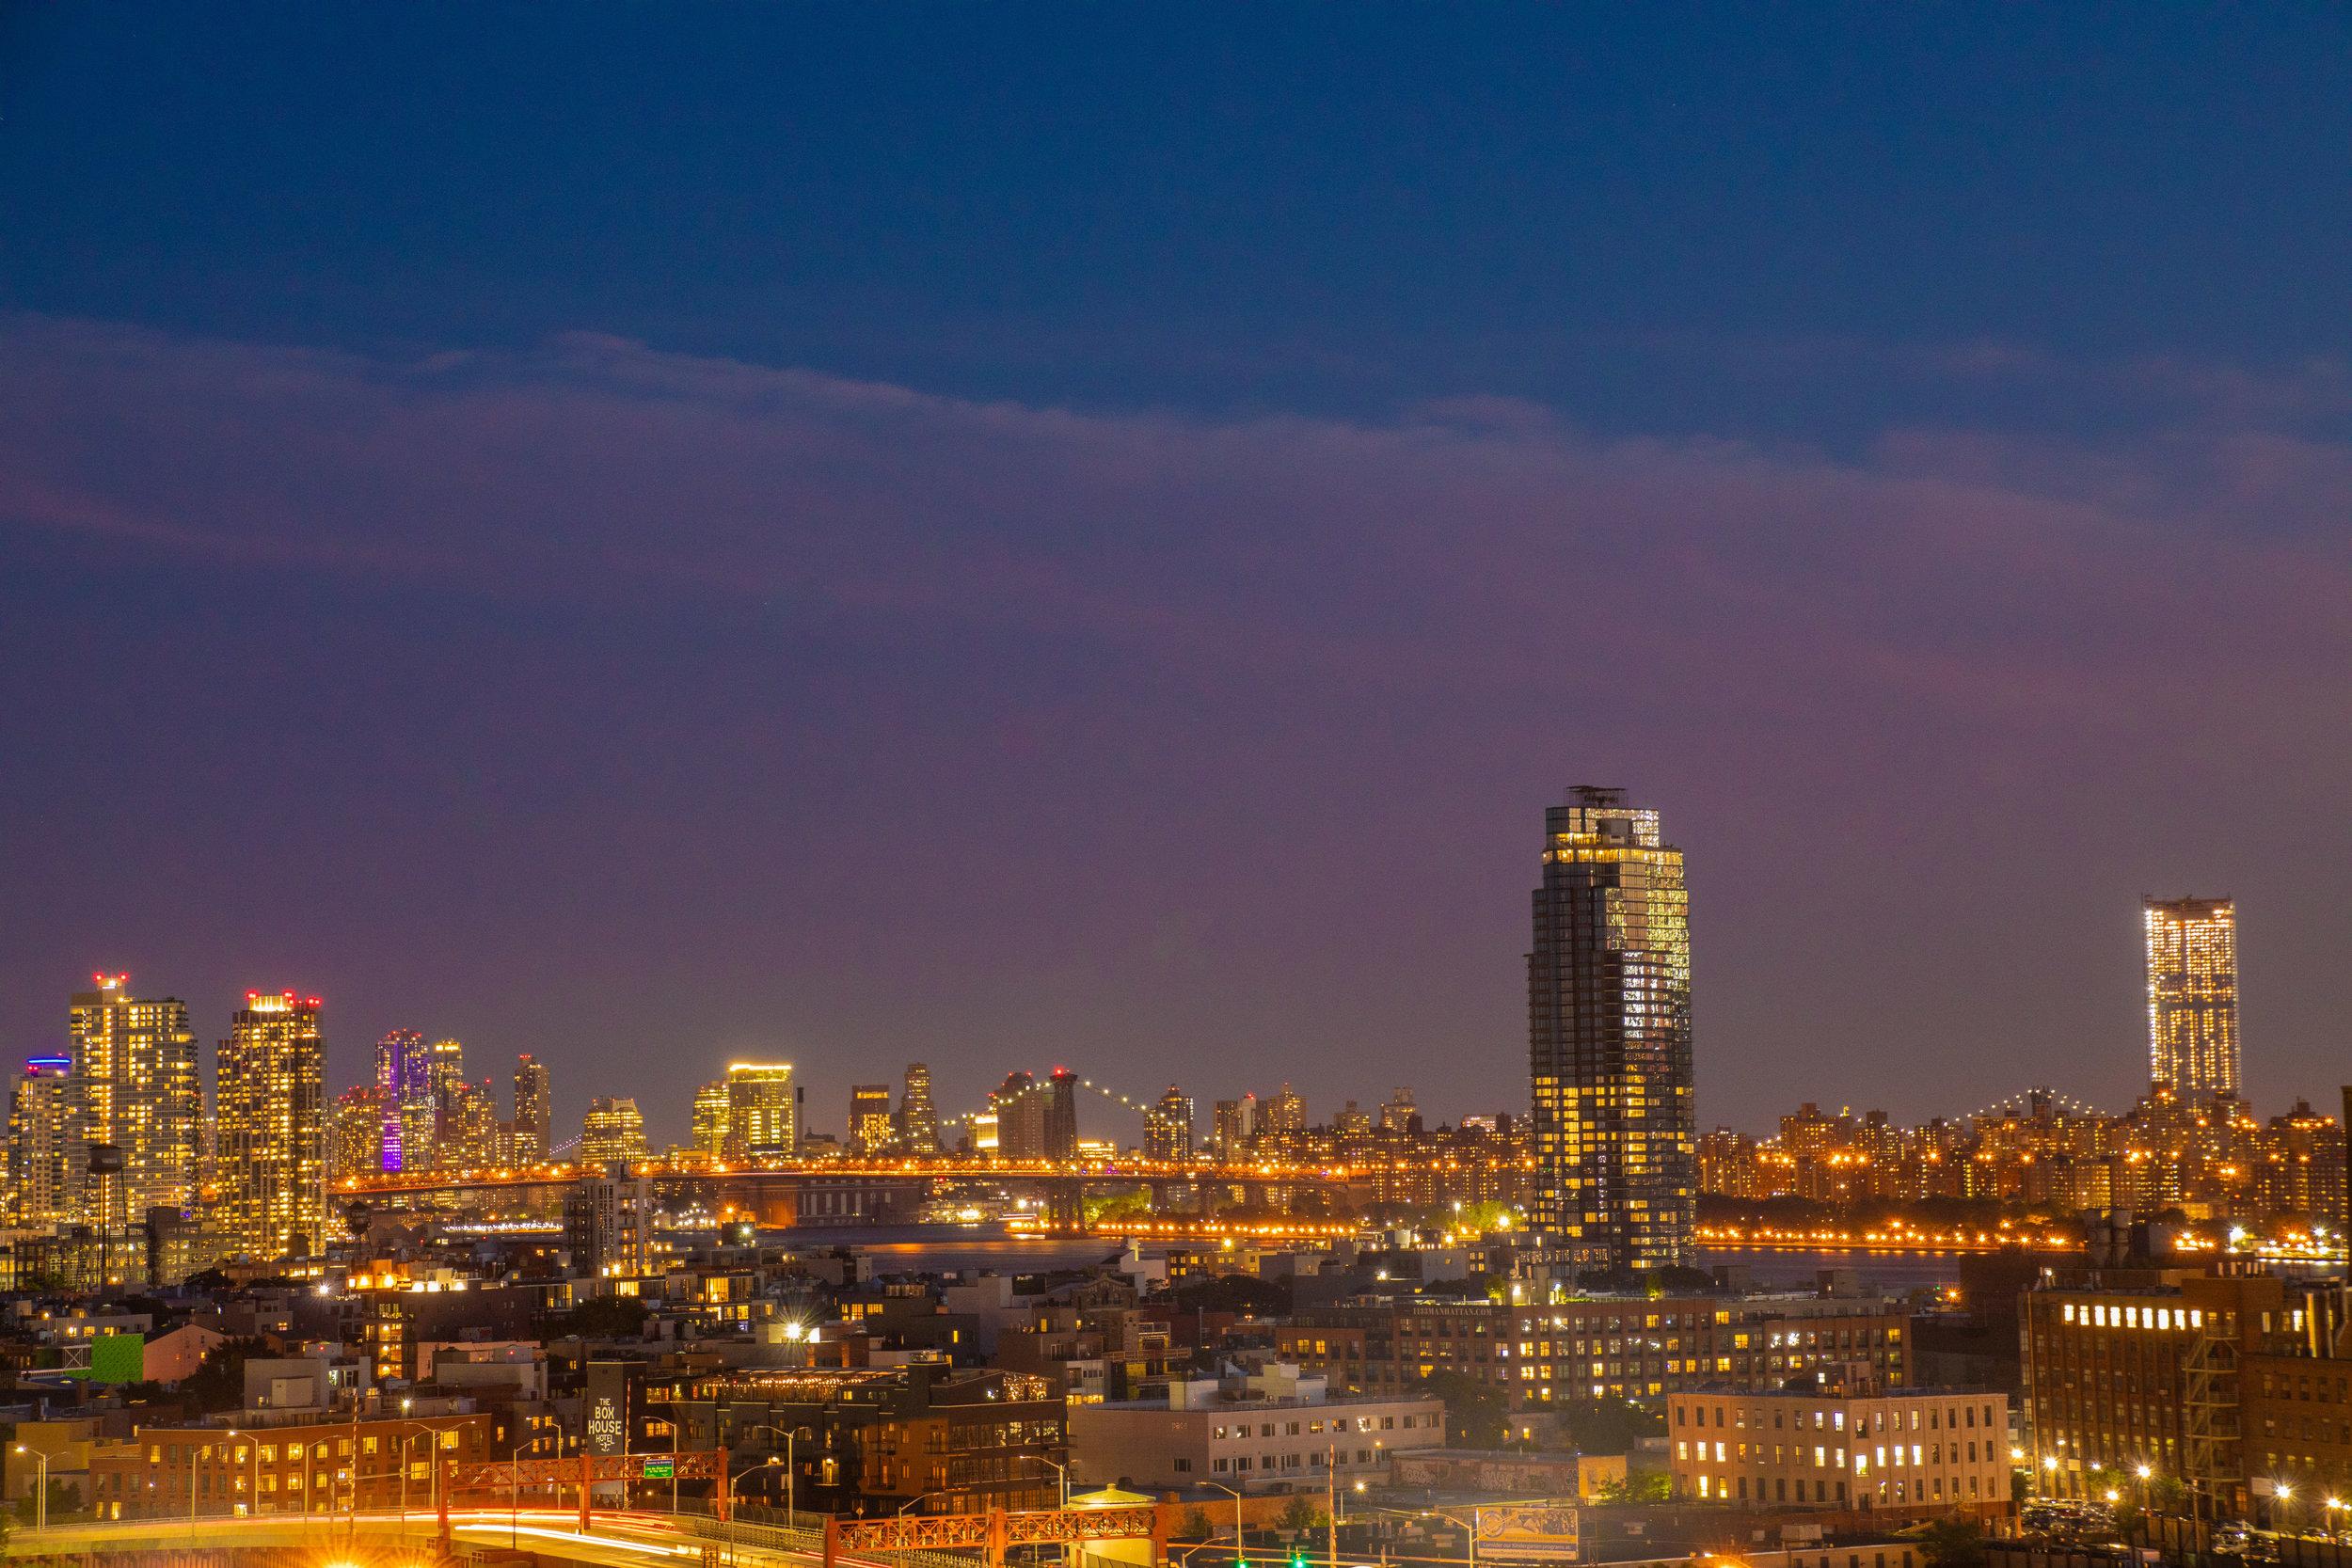 LSNY_Night_City_Views-26.jpg